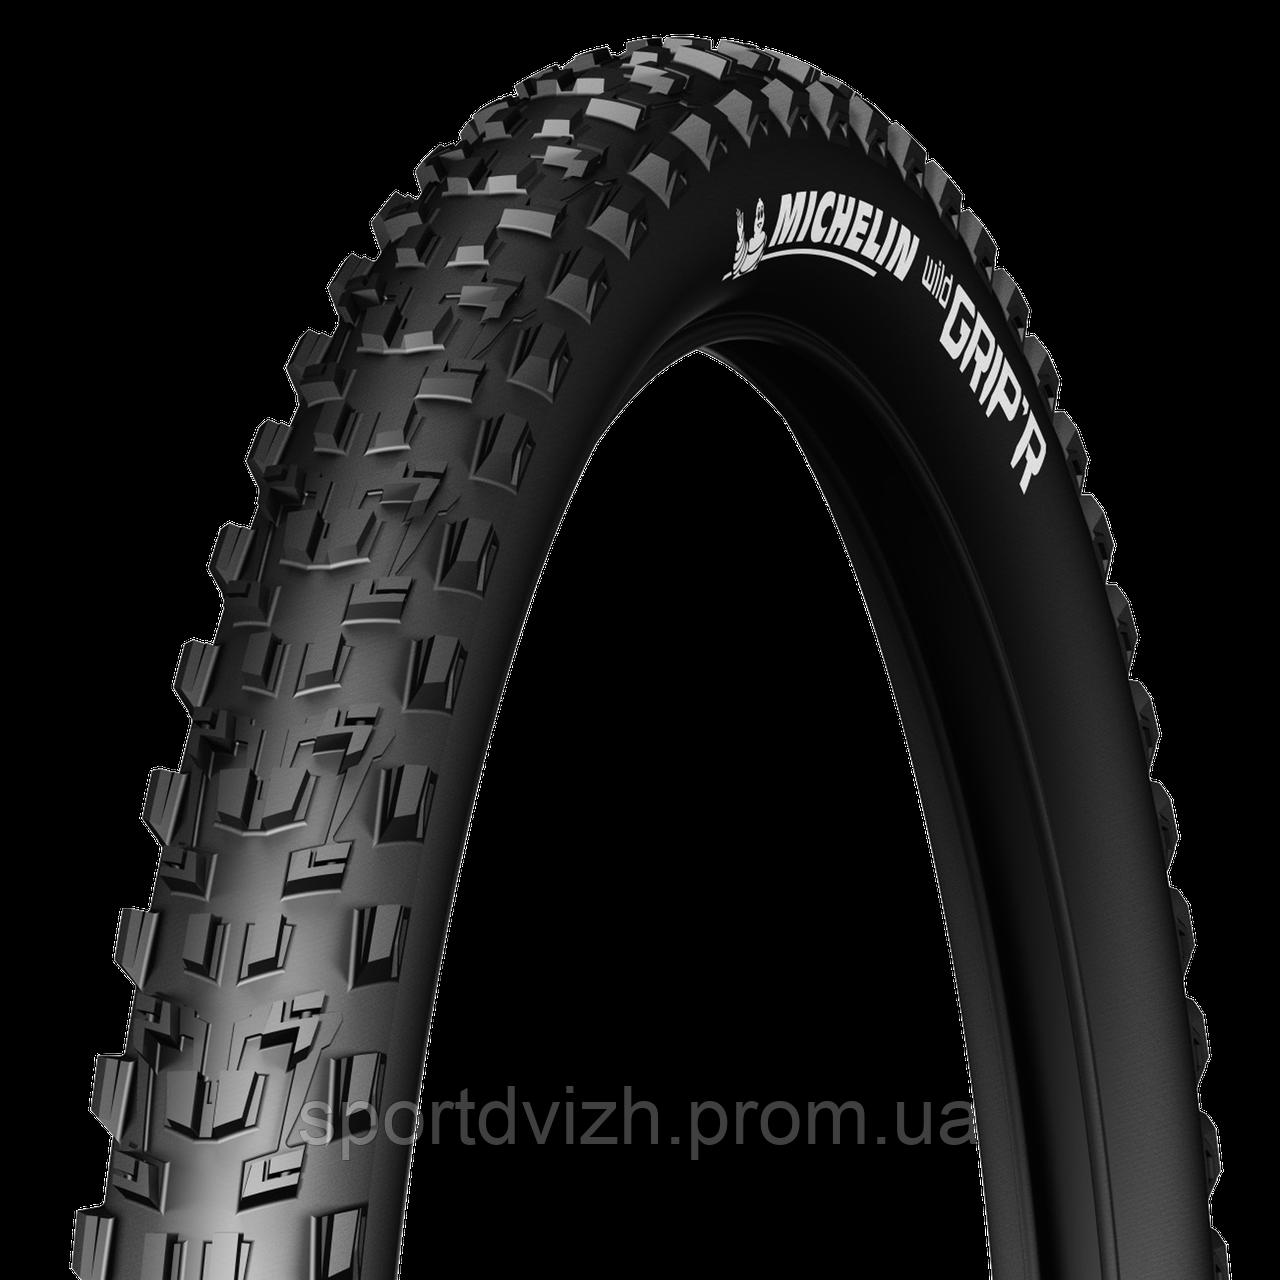 michelin Покрышка Michelin WILDGRIPR2 TS 26 (26X2.10) MTB, бескамерная, черный 485318